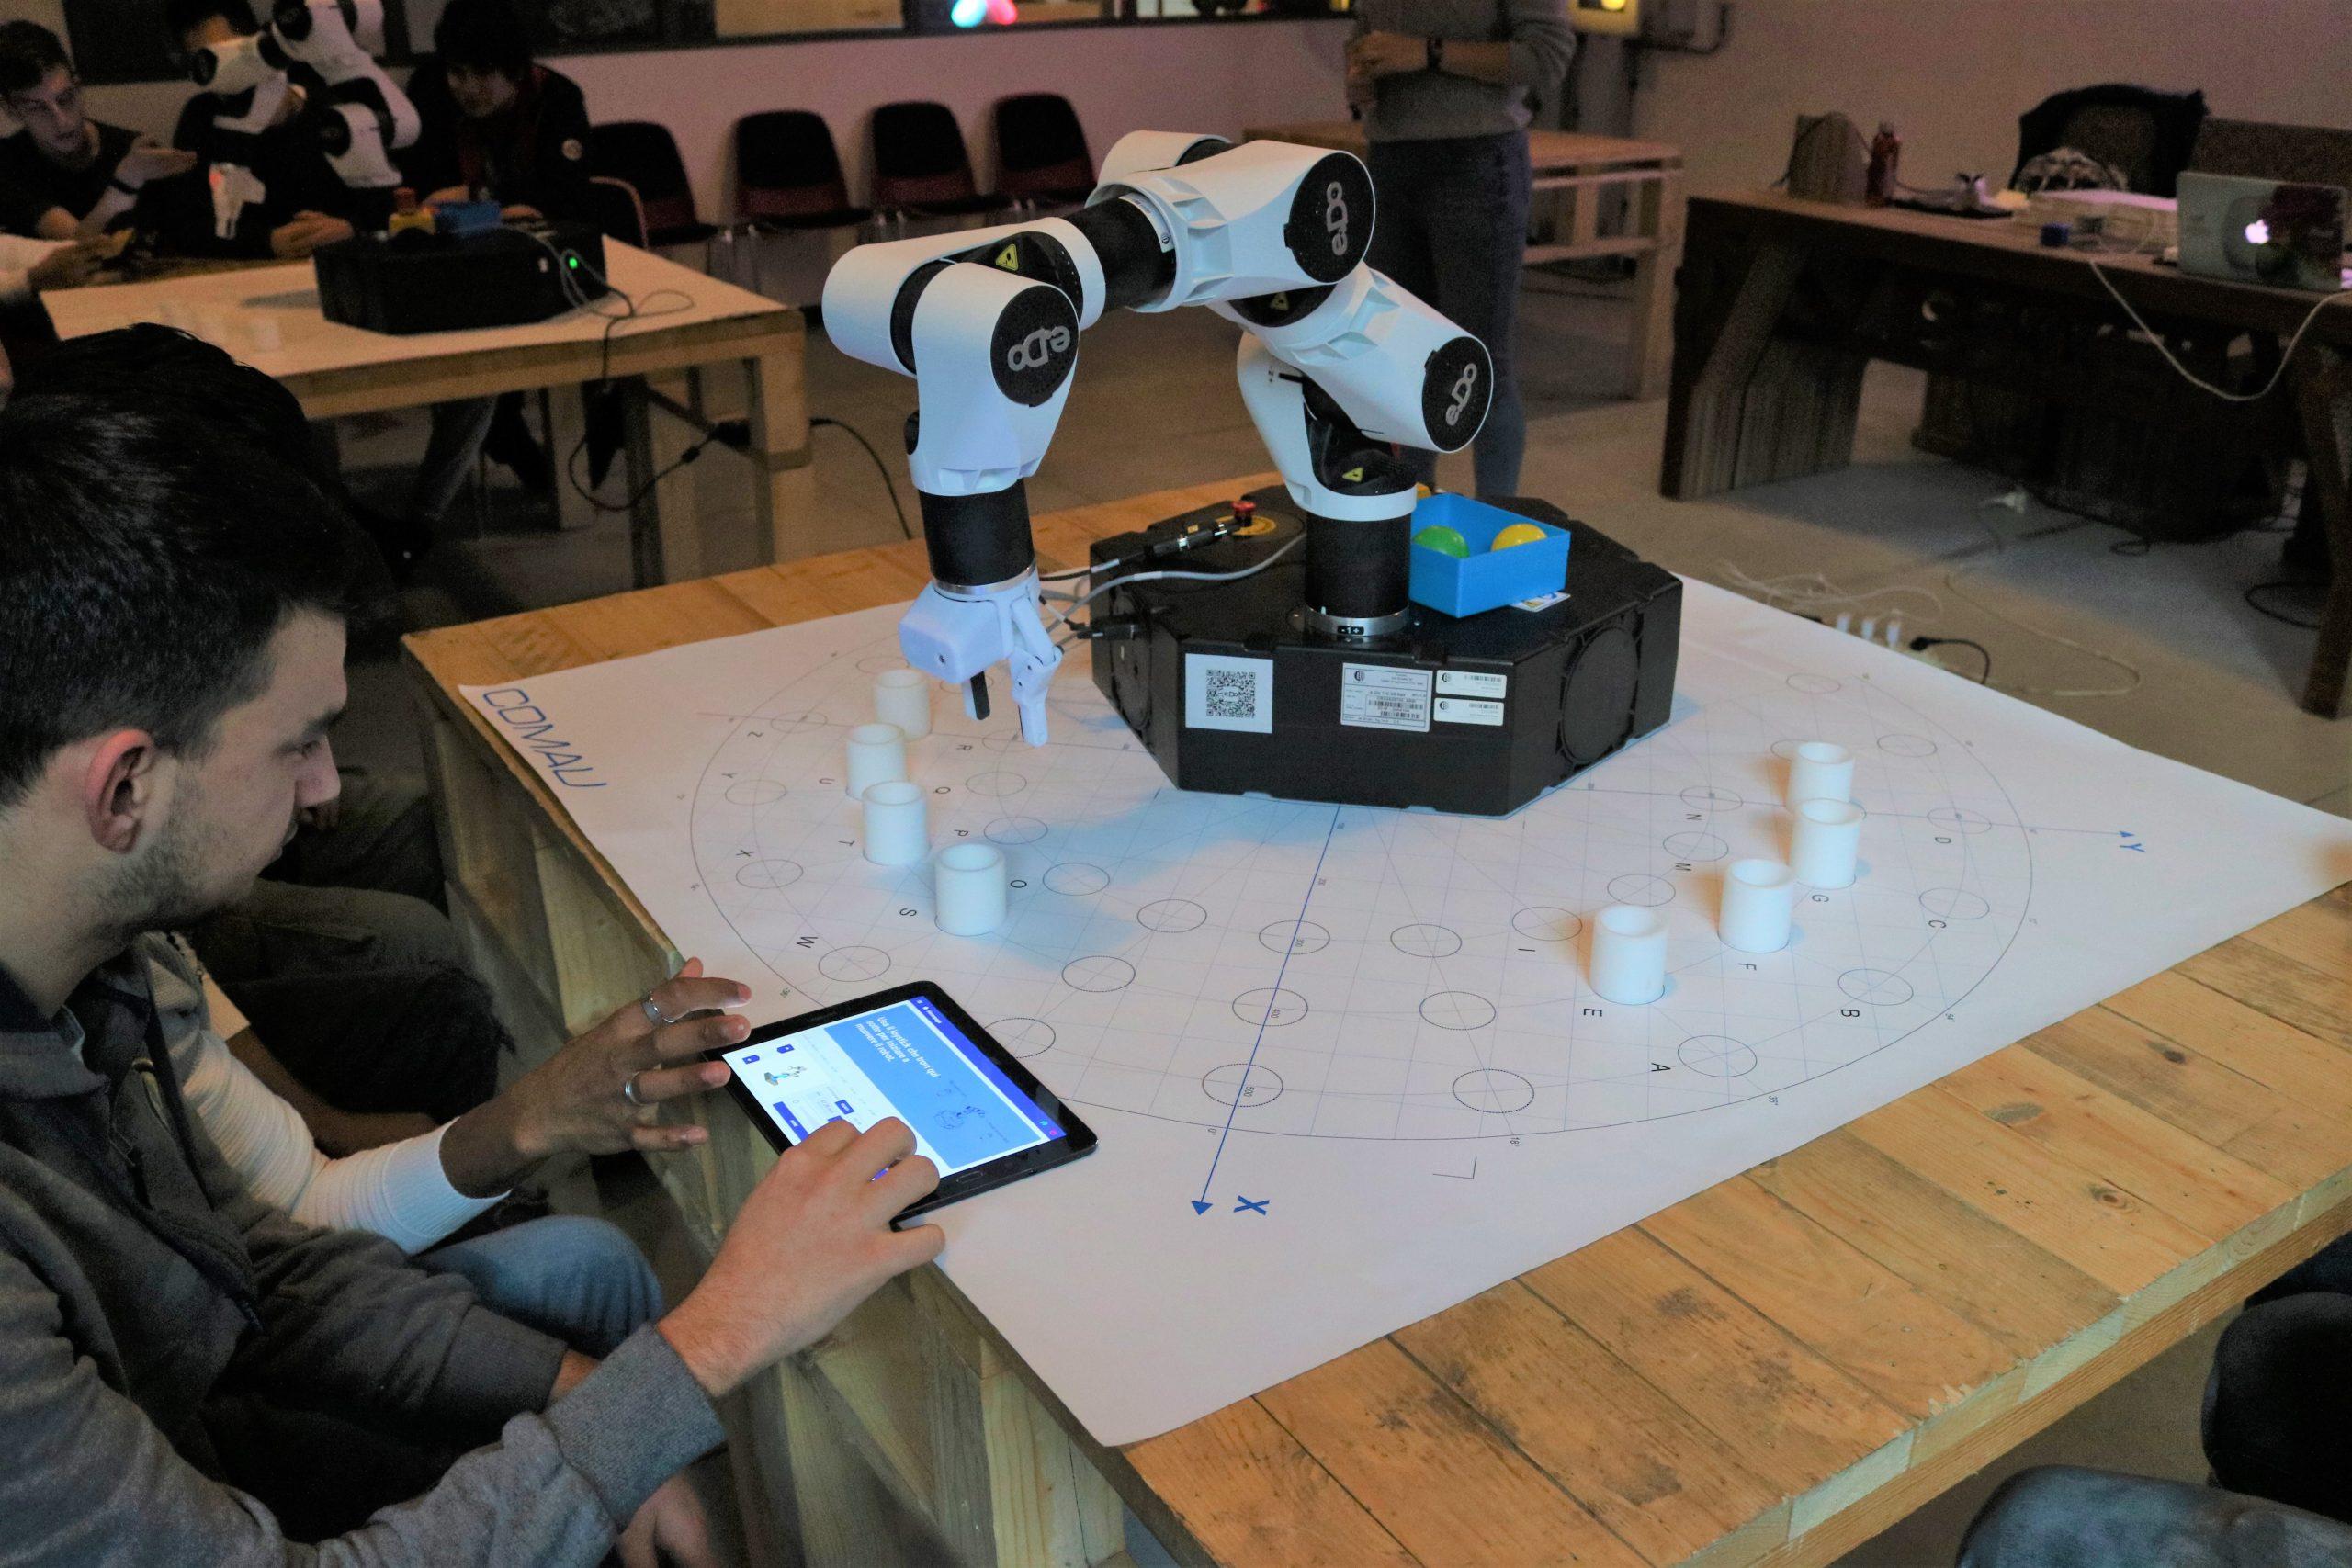 Come programmare un robot: a